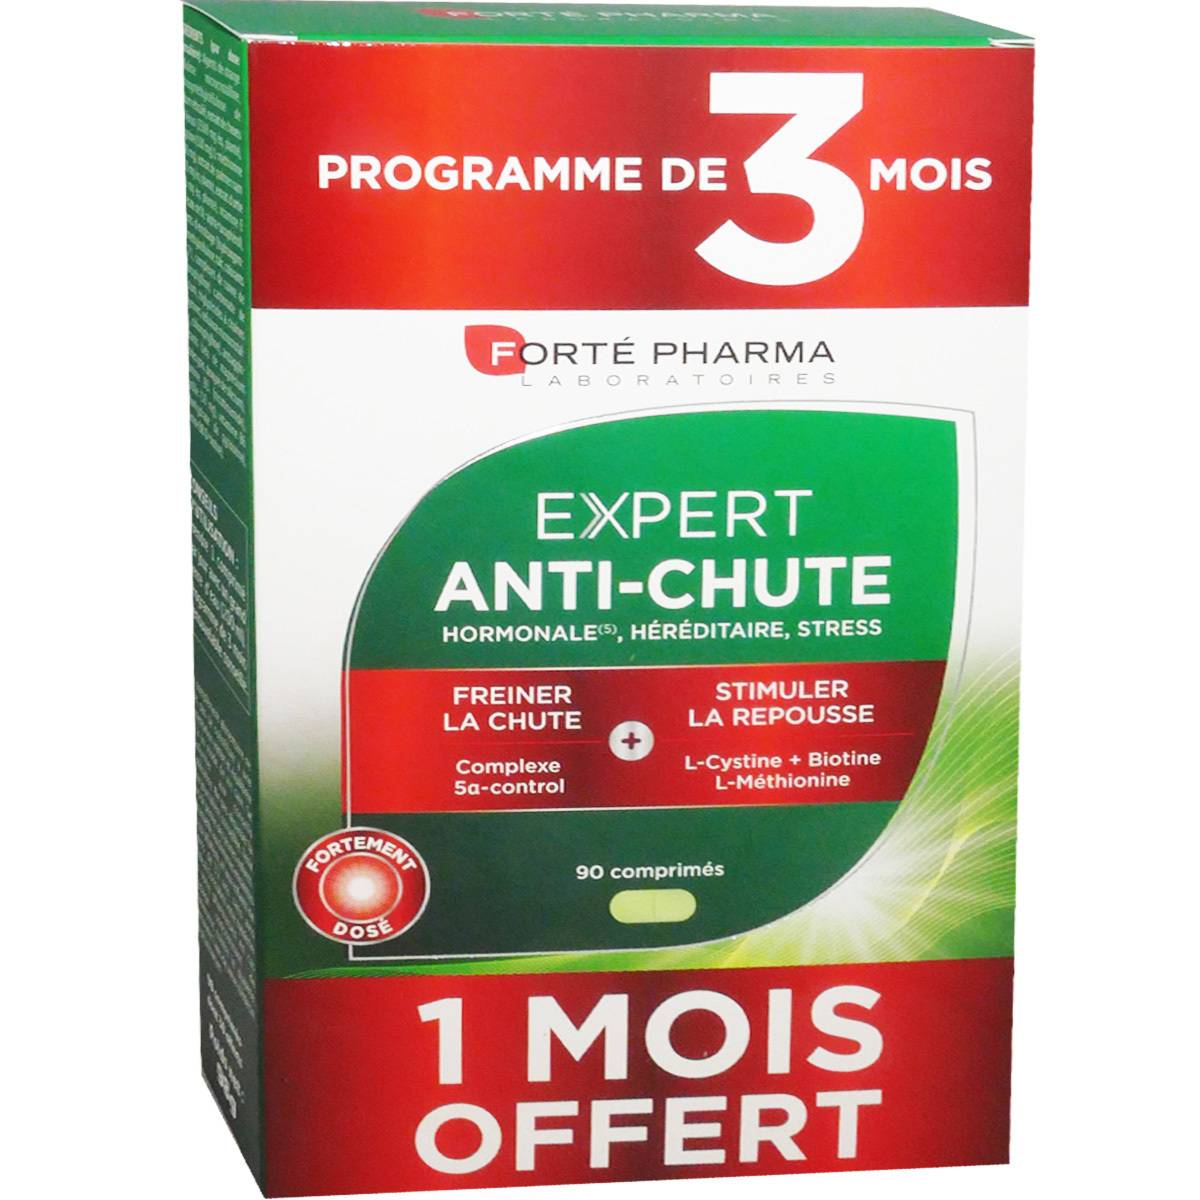 Forte pharma expert anti-chute 3 mois 90 comprimes